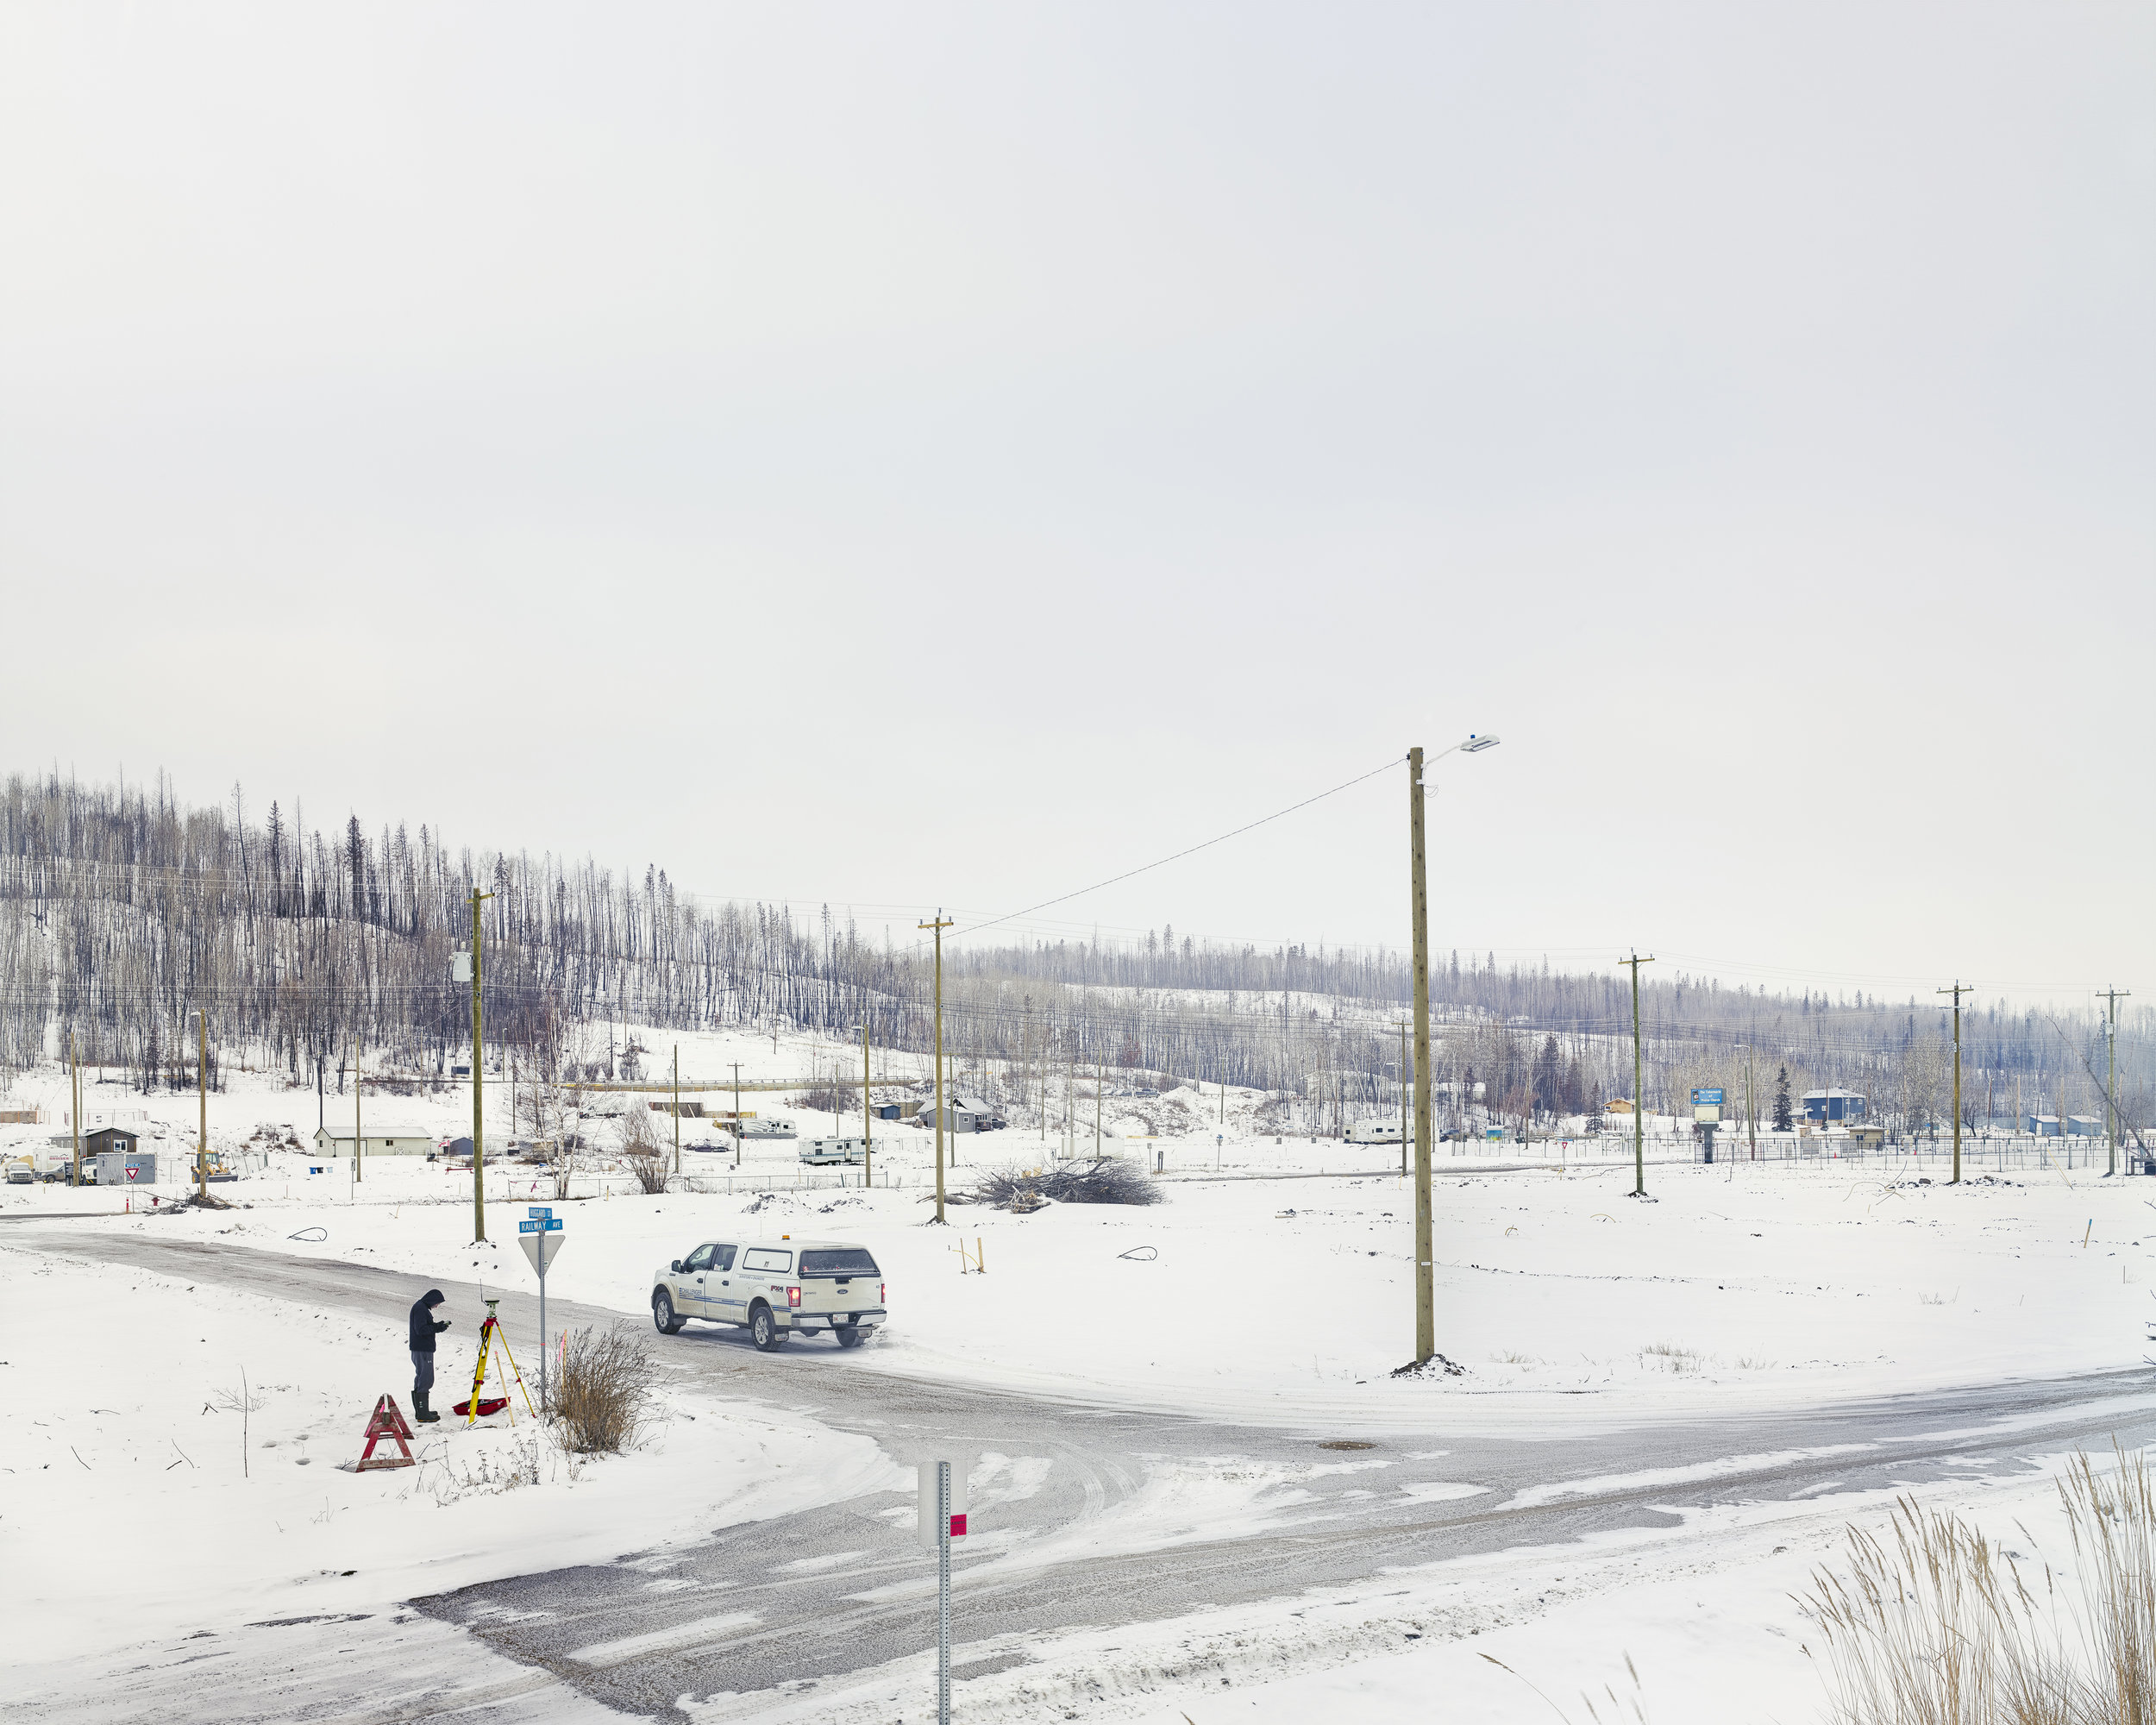 Saline Creek Drive, Fort McMurray, Alberta, Canada. 100cm x 120cm